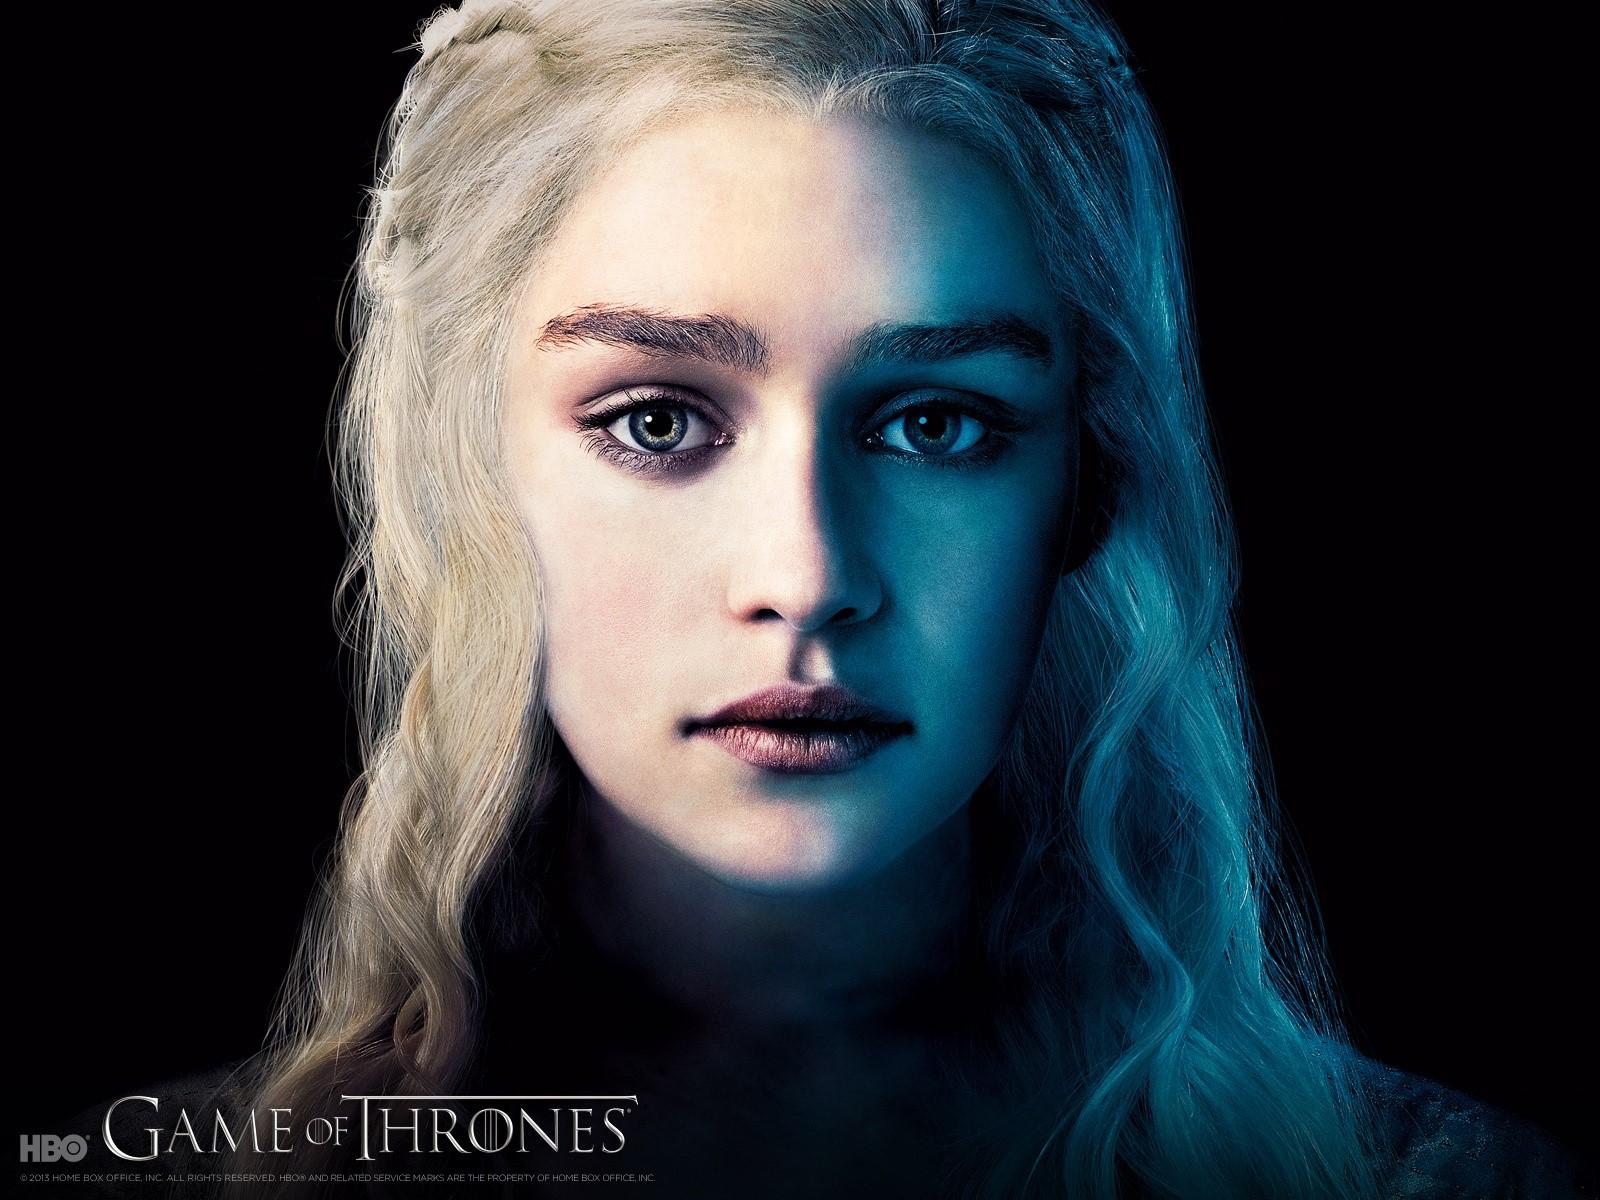 Wallpaper Emilia Clarke in Game of thrones